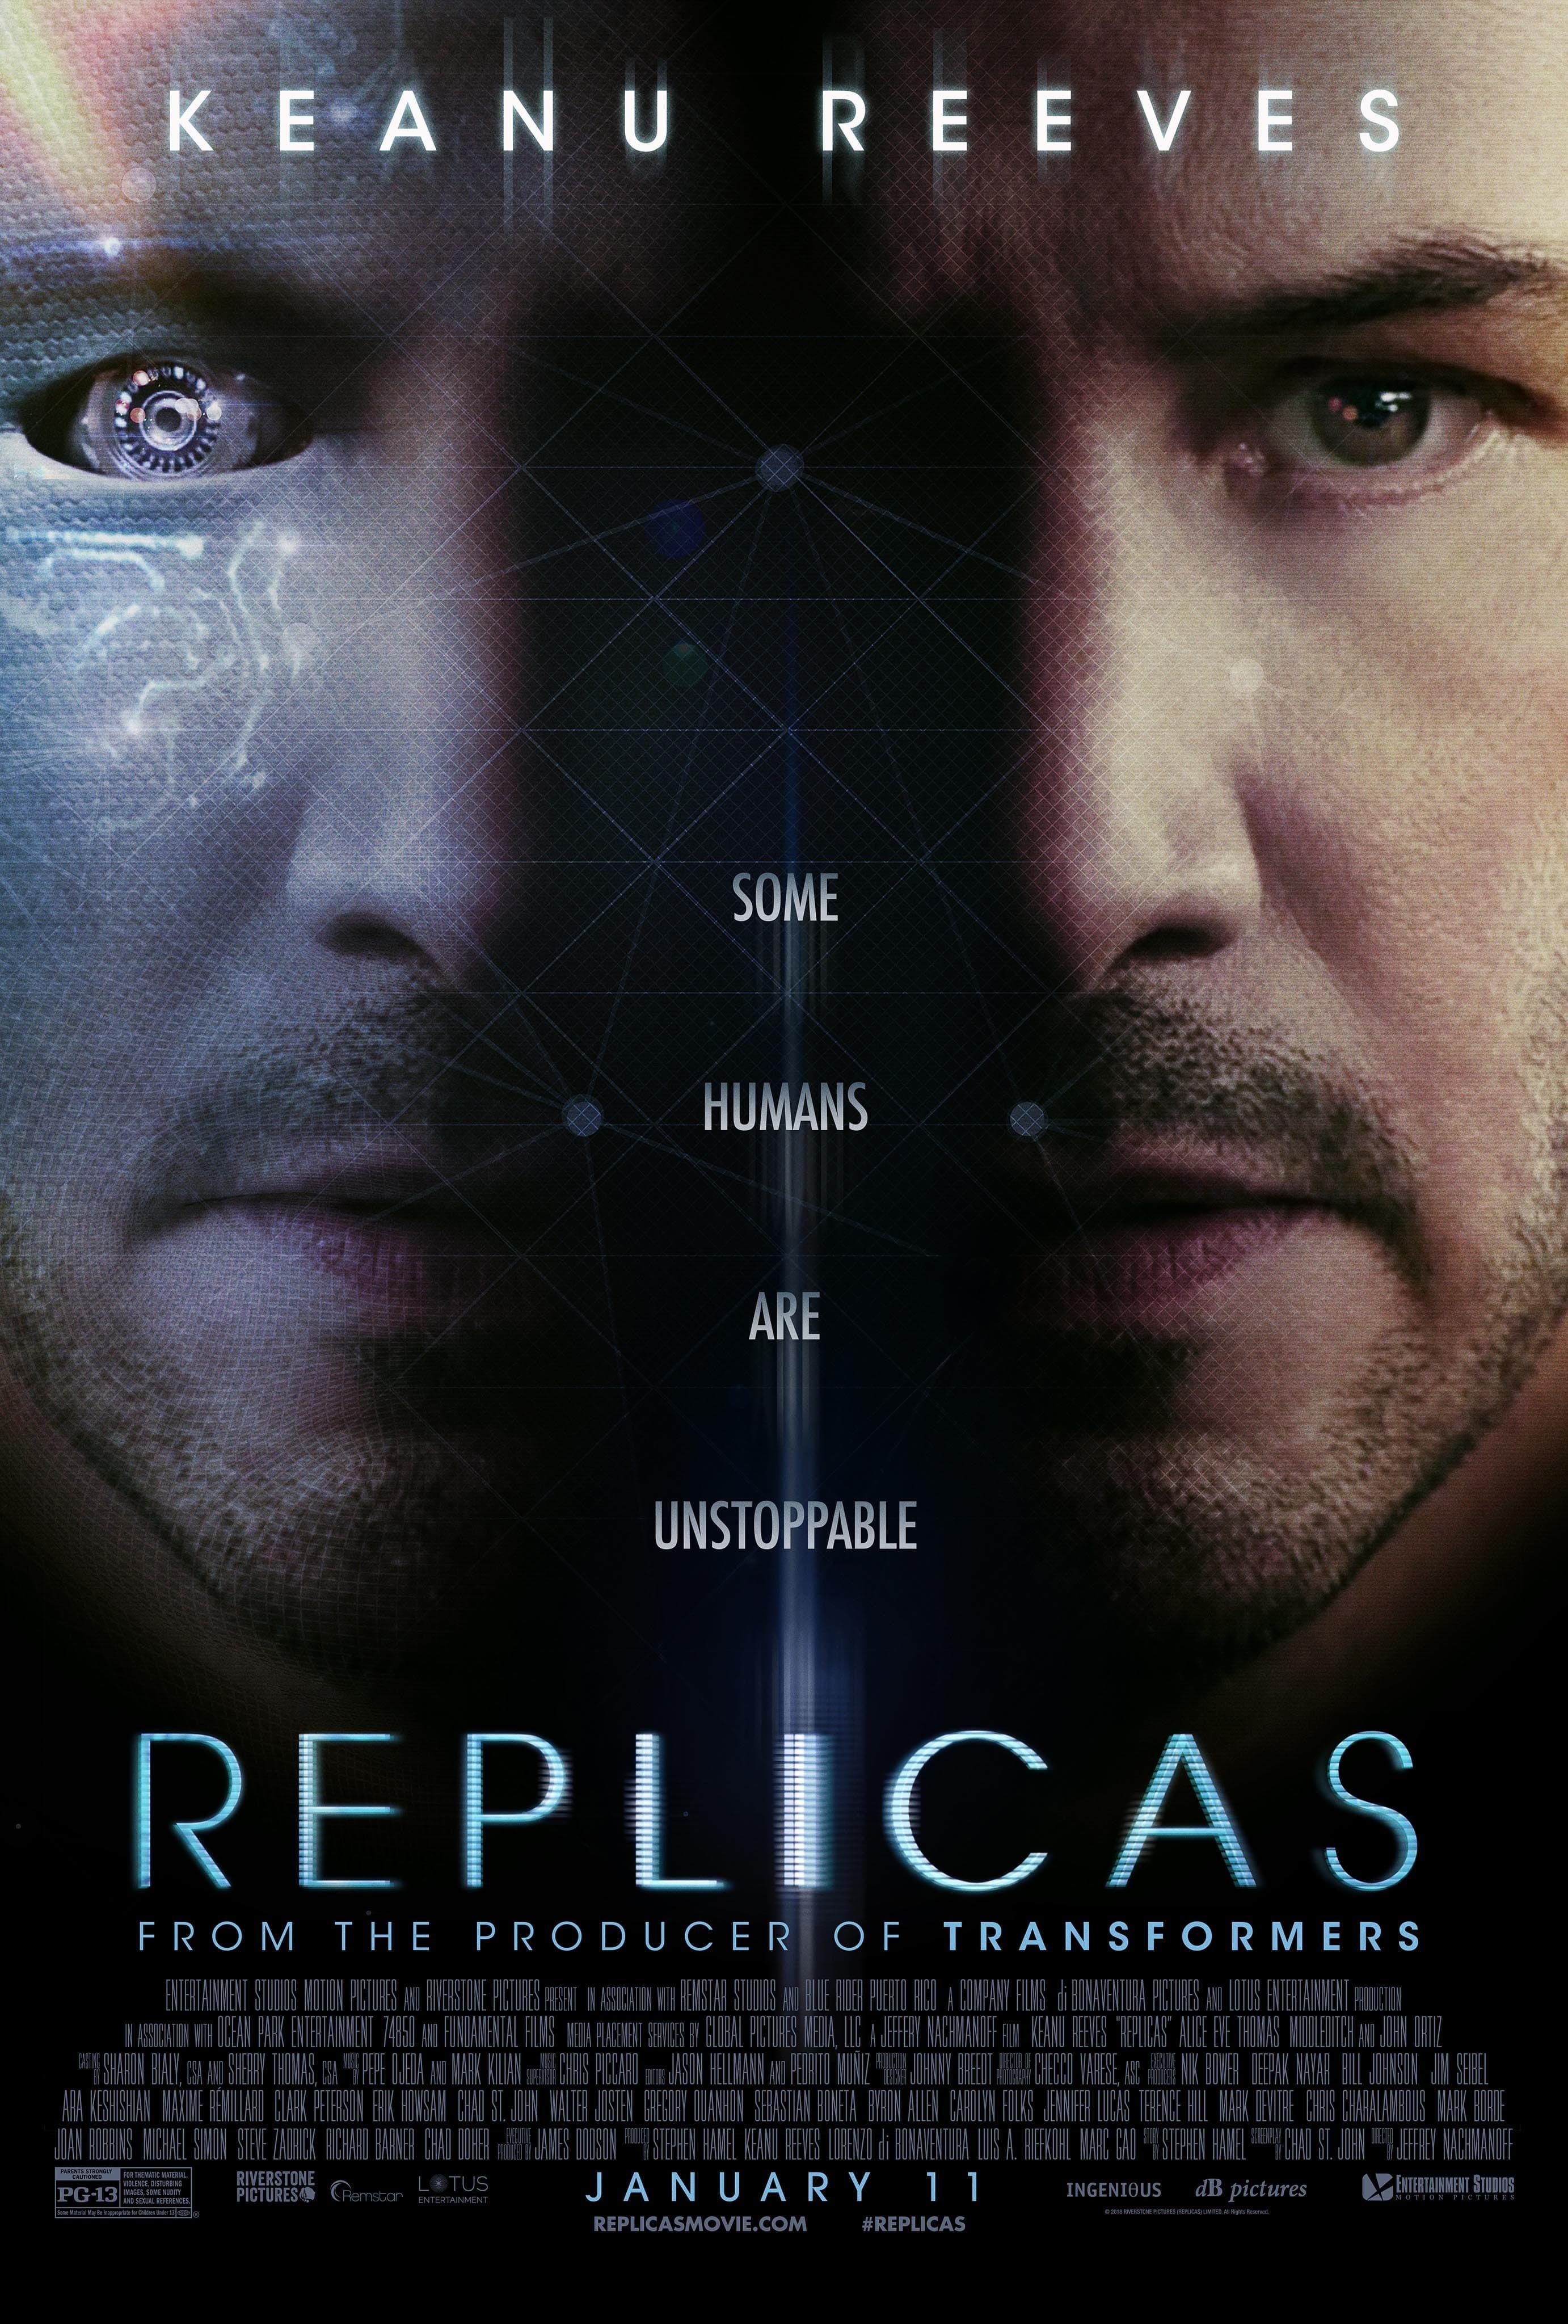 Keanu Reeves Movie Replicas From Materialism To Dehumanizing Transhumanism To Humanism Truefreethinker Com Keanu Reeves Download Filmes Filmes